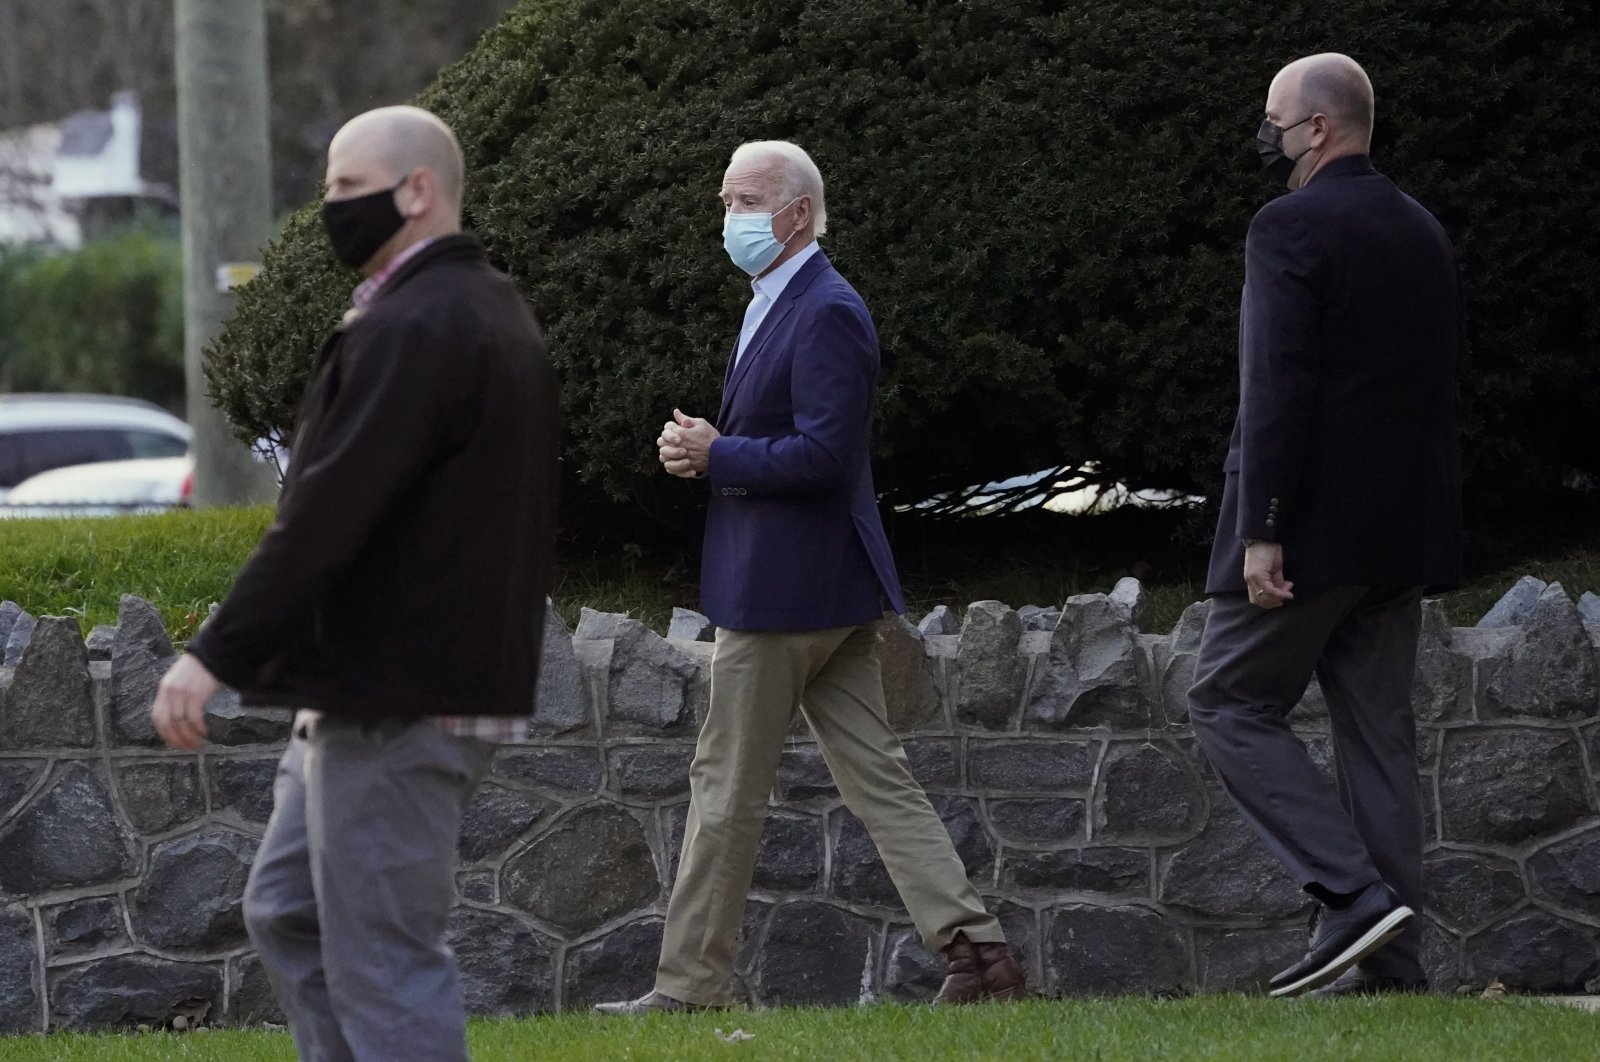 President-elect Joe Biden leaves St. Ann Parish in Wilmington, Delaware, Nov. 21, 2020. (AP Photo)